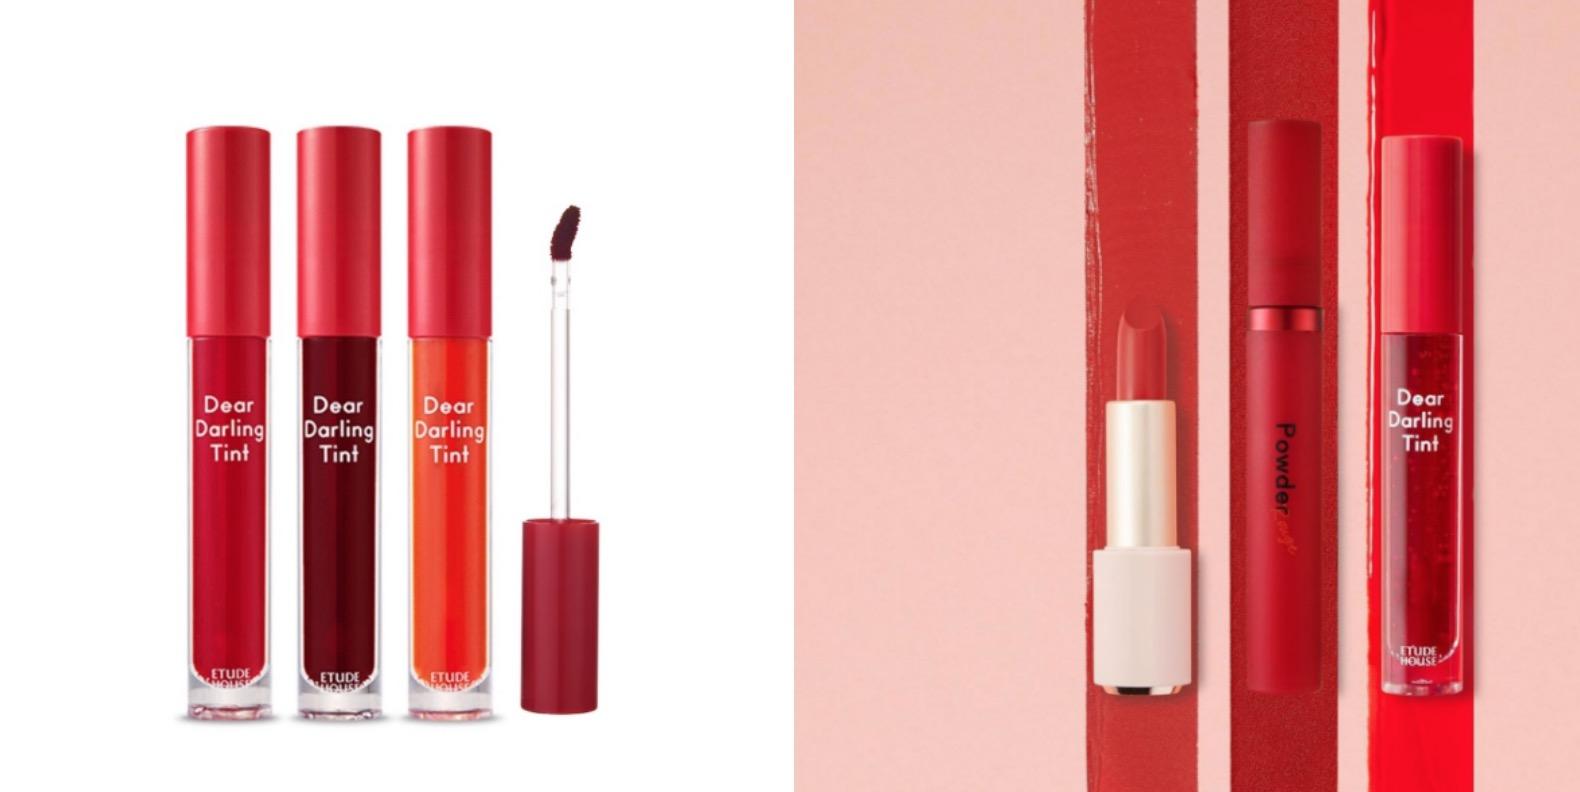 ETUDE HOUSE的唇彩主打超飽和、高顯色、水潤又不卡紋,這支唇釀在品牌中是年度唇彩人氣排行榜前三名,可以說是韓妞化妝包常備品。